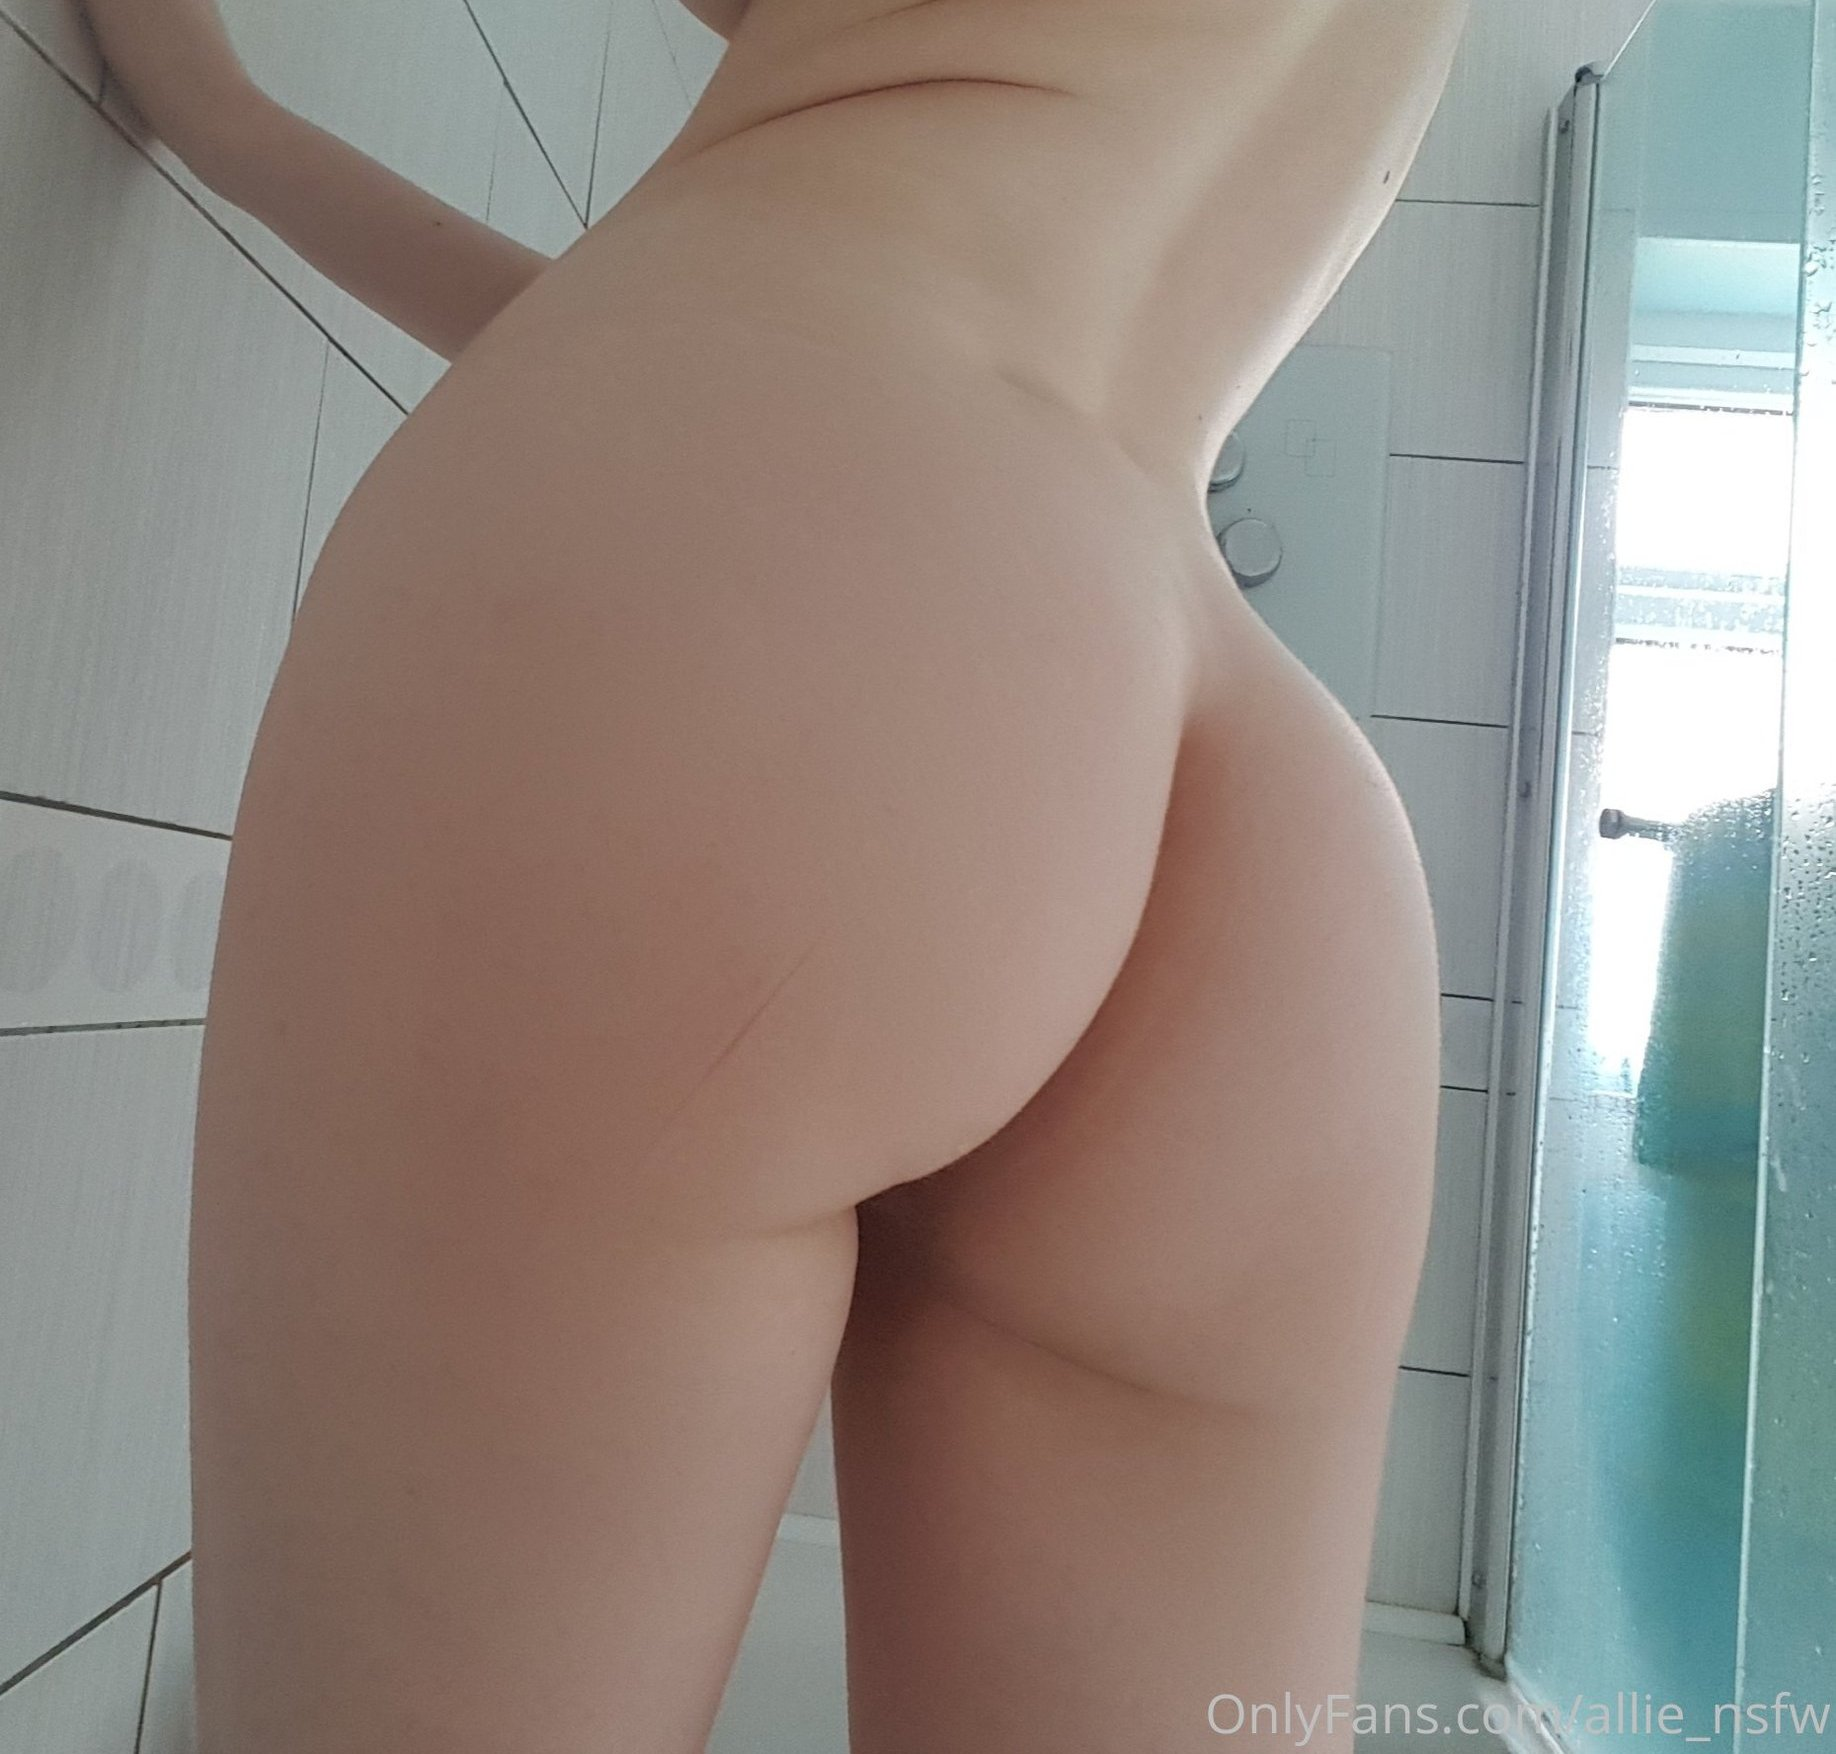 Allie Alliensfw Onlyfans Nude Leaks 0013